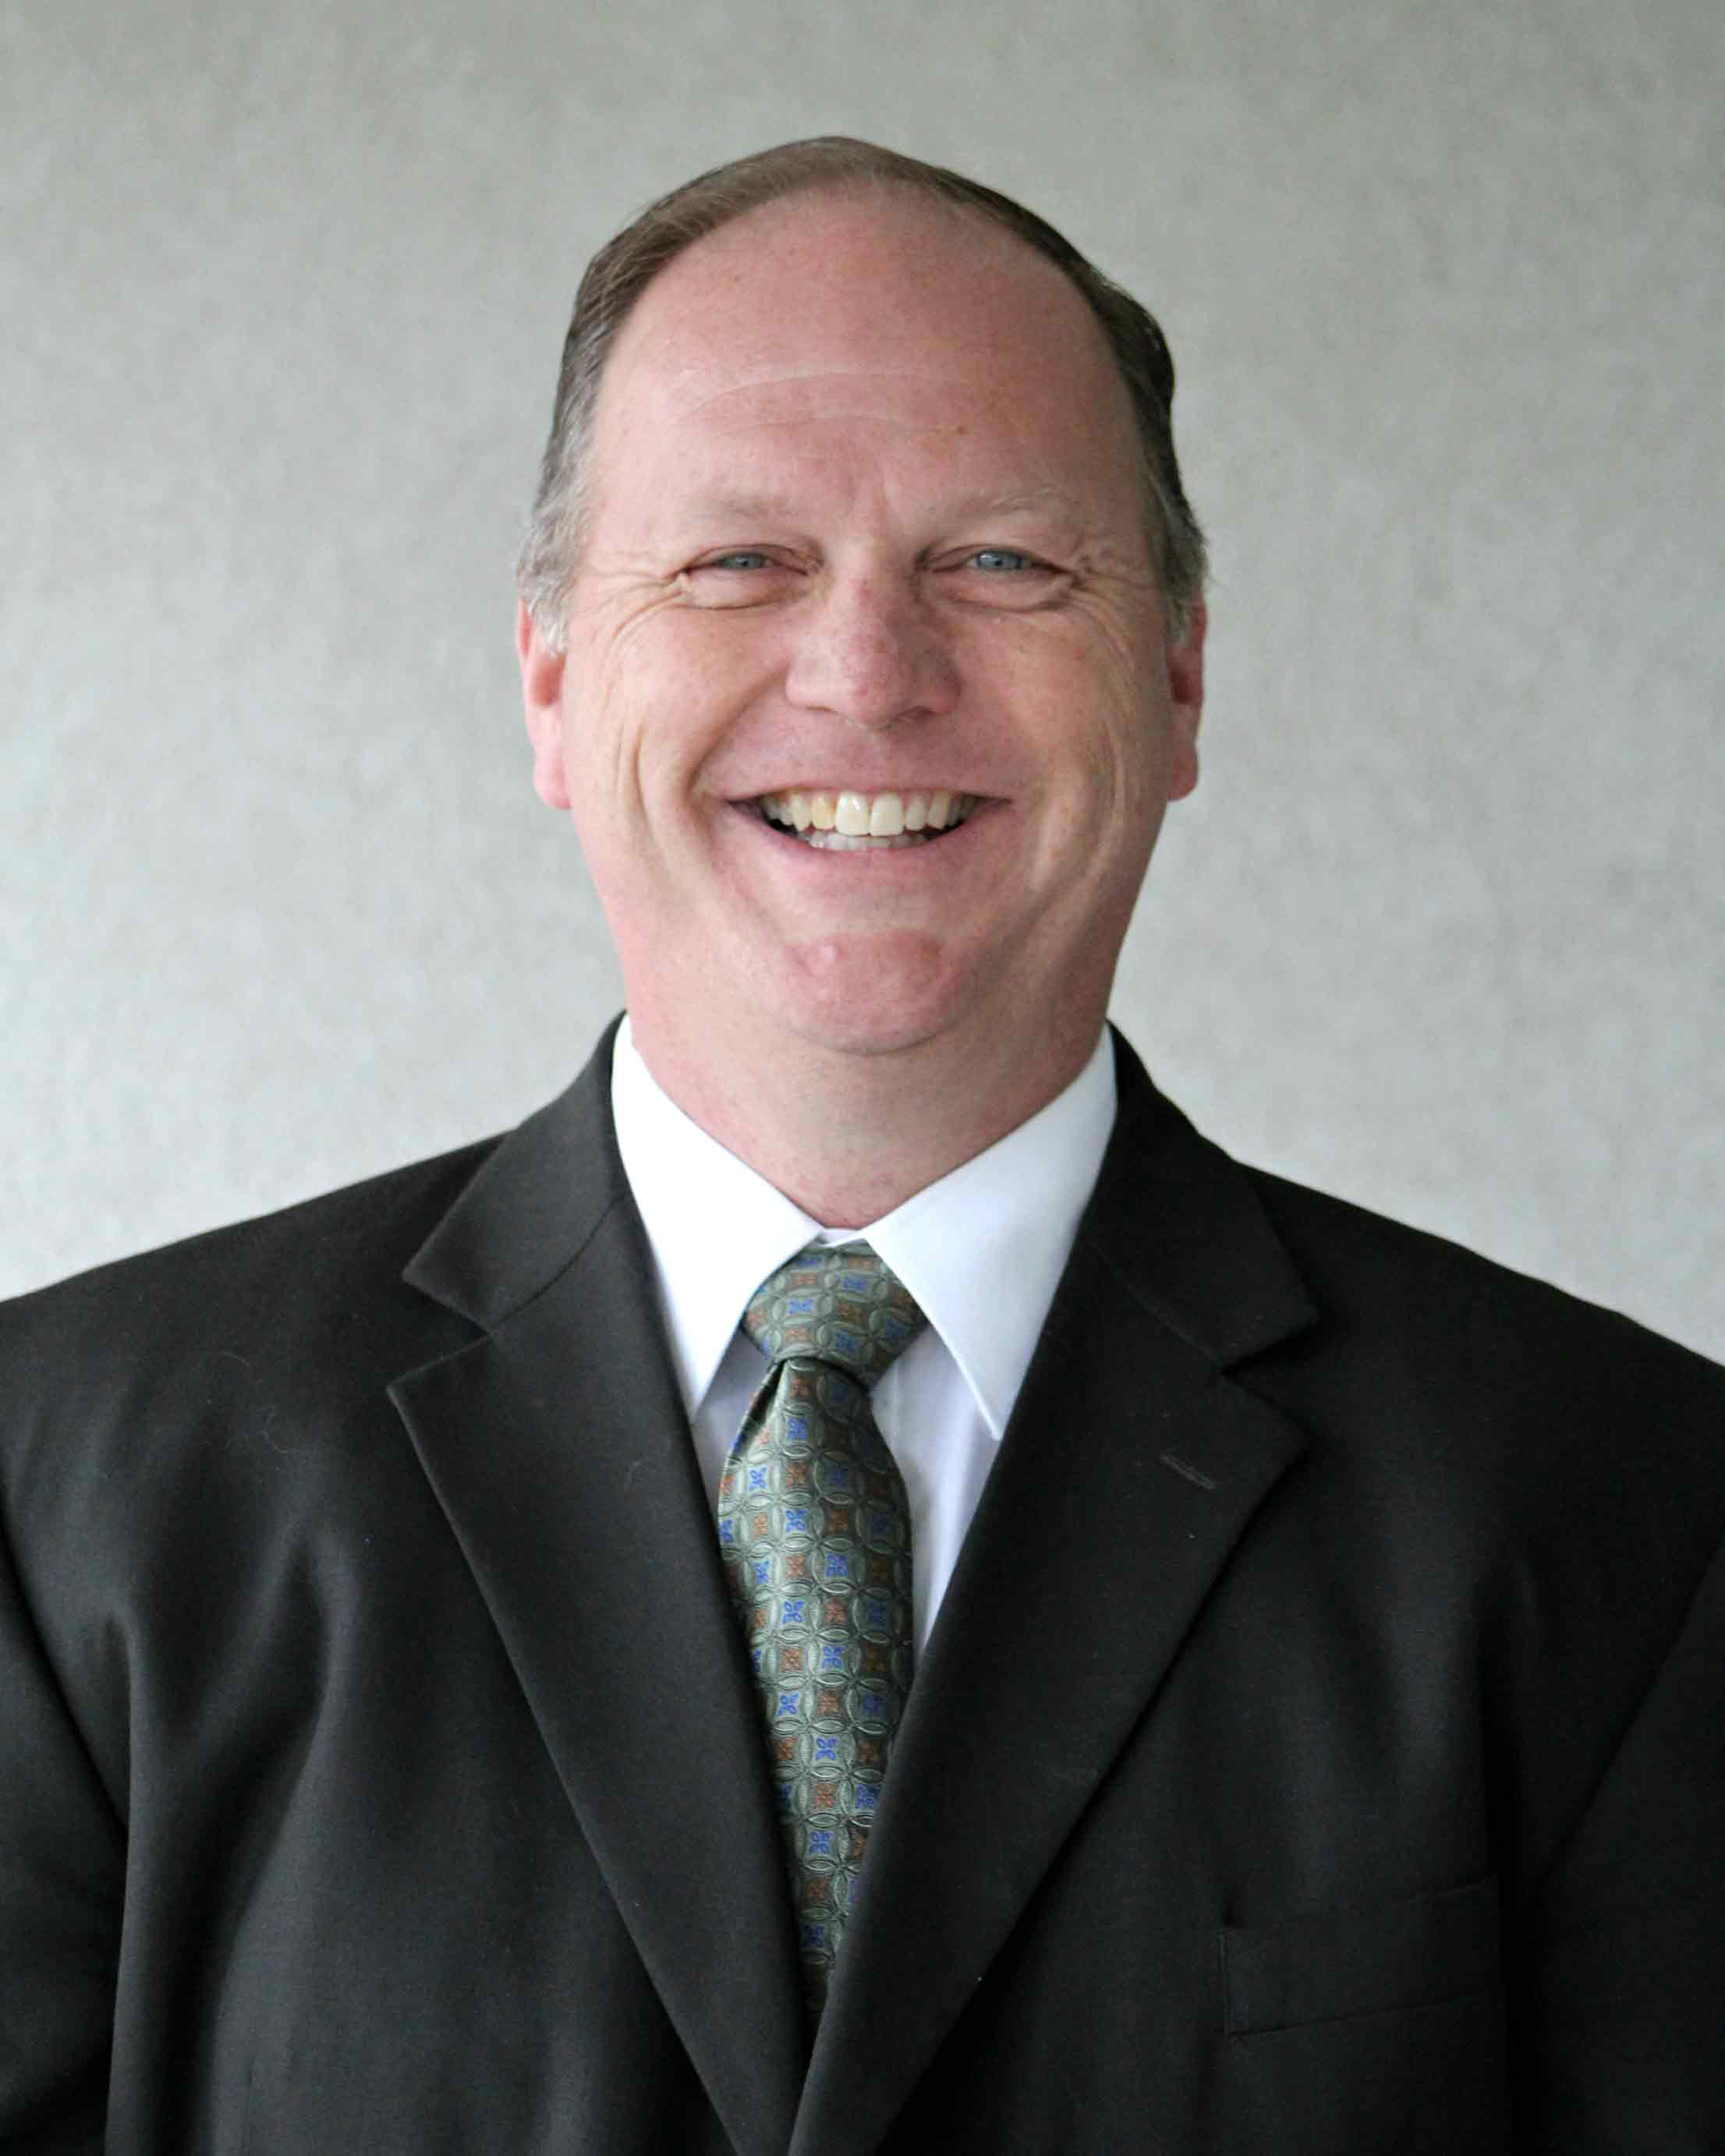 Doug Tarter